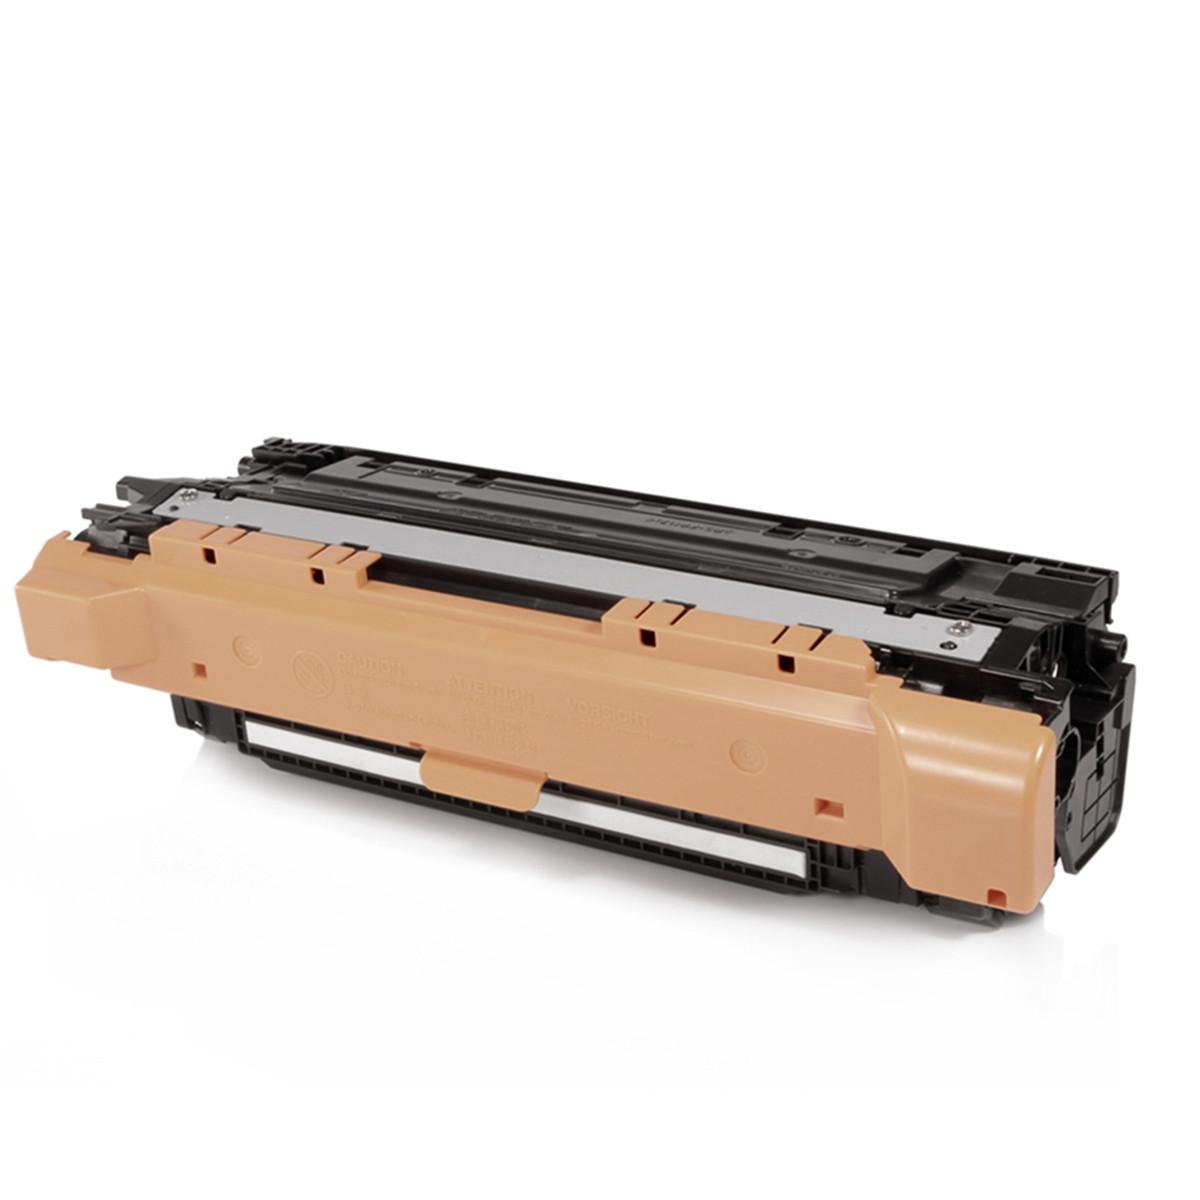 Toner Compatível com HP CE250A Preto | CP3525 CM3530 CP3525DN CP3525N CP3525X CM3530FS | Evolut 5k